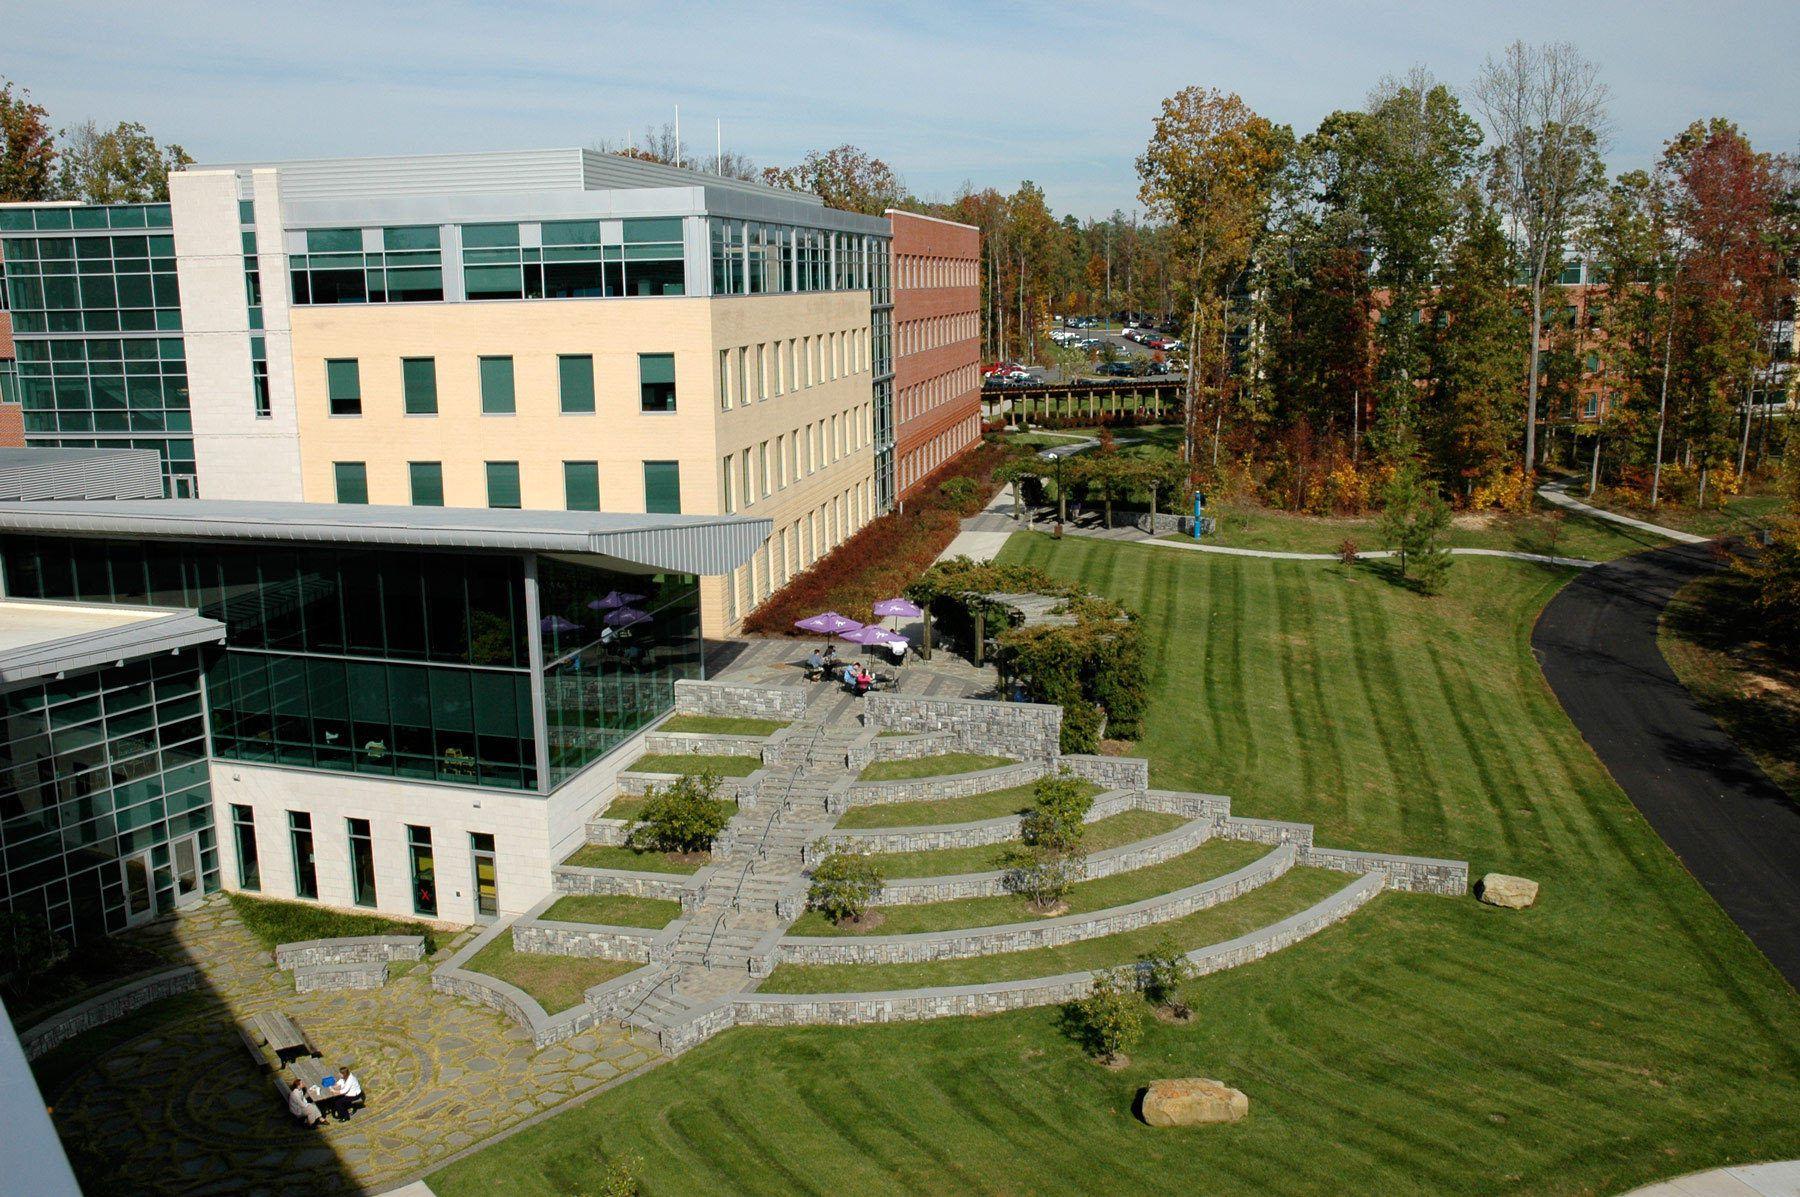 Capital One - Richmond VA West Creek Campus - Goochland Va